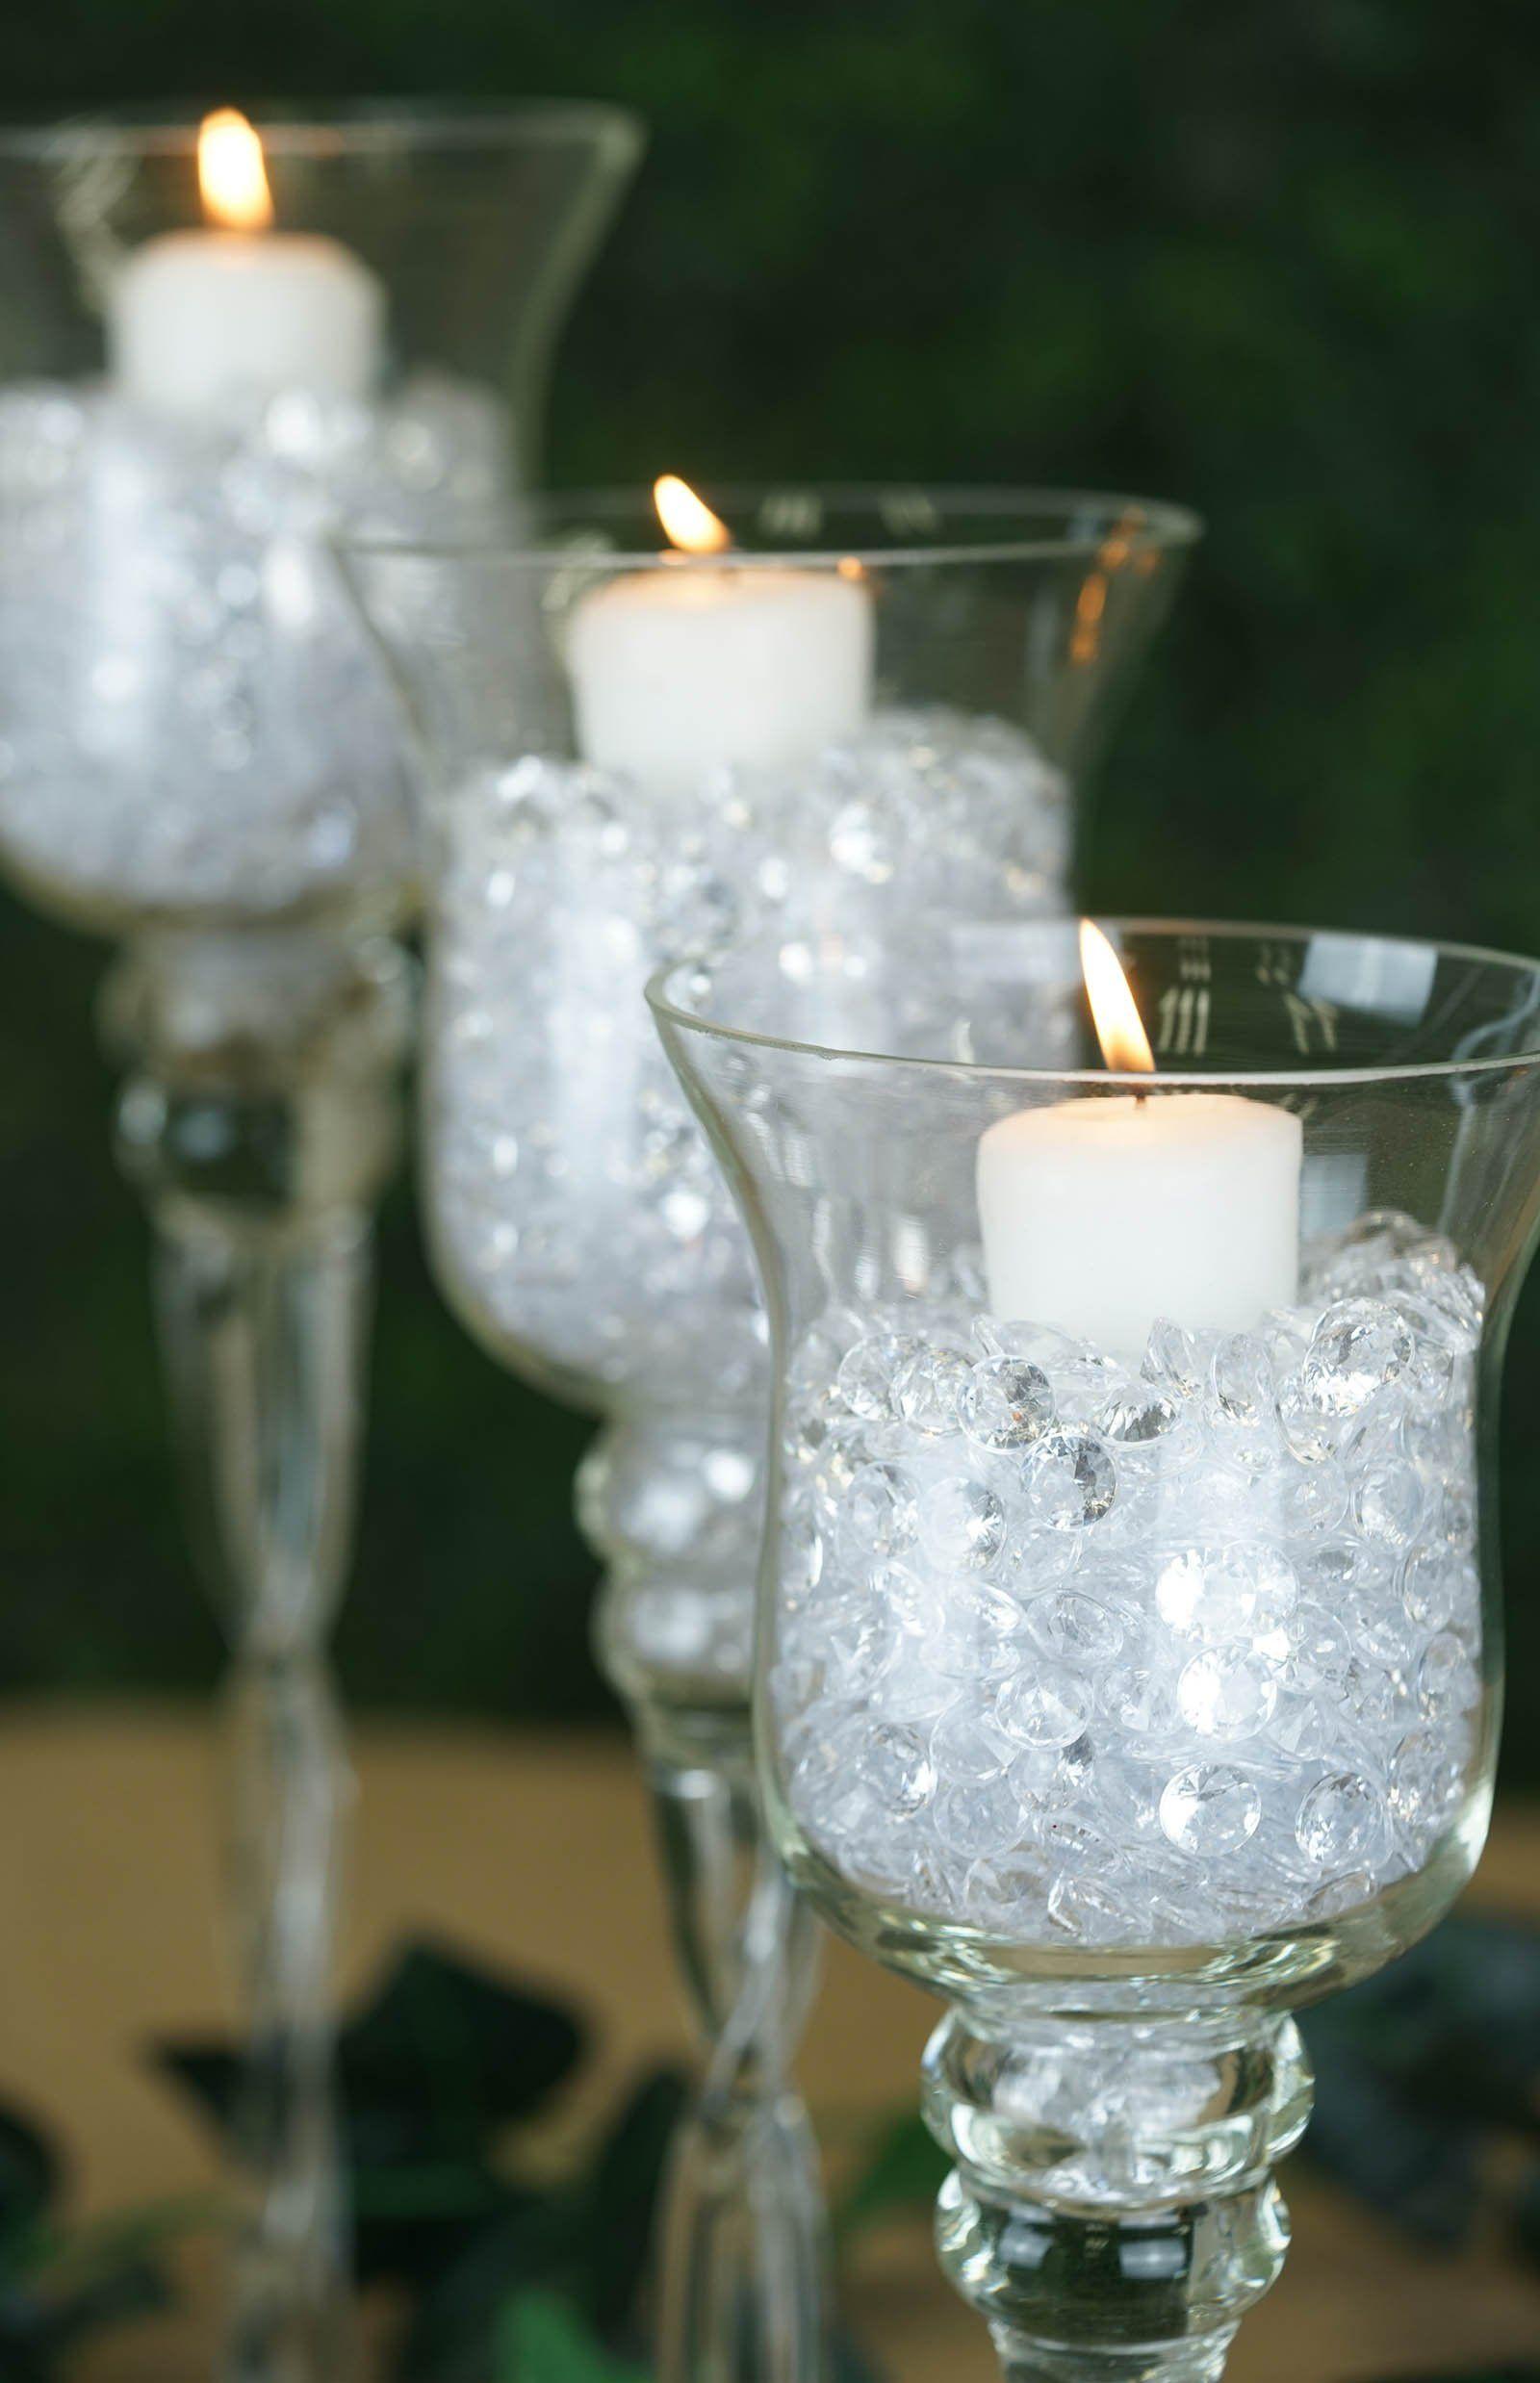 Set Of 3 Hurricane Long Stem Glass Vase Candle Holder Set 12 14 16 Hurricane Glass Centerpiece Long Stem Glass Candle Holders Holiday Table Centerpieces